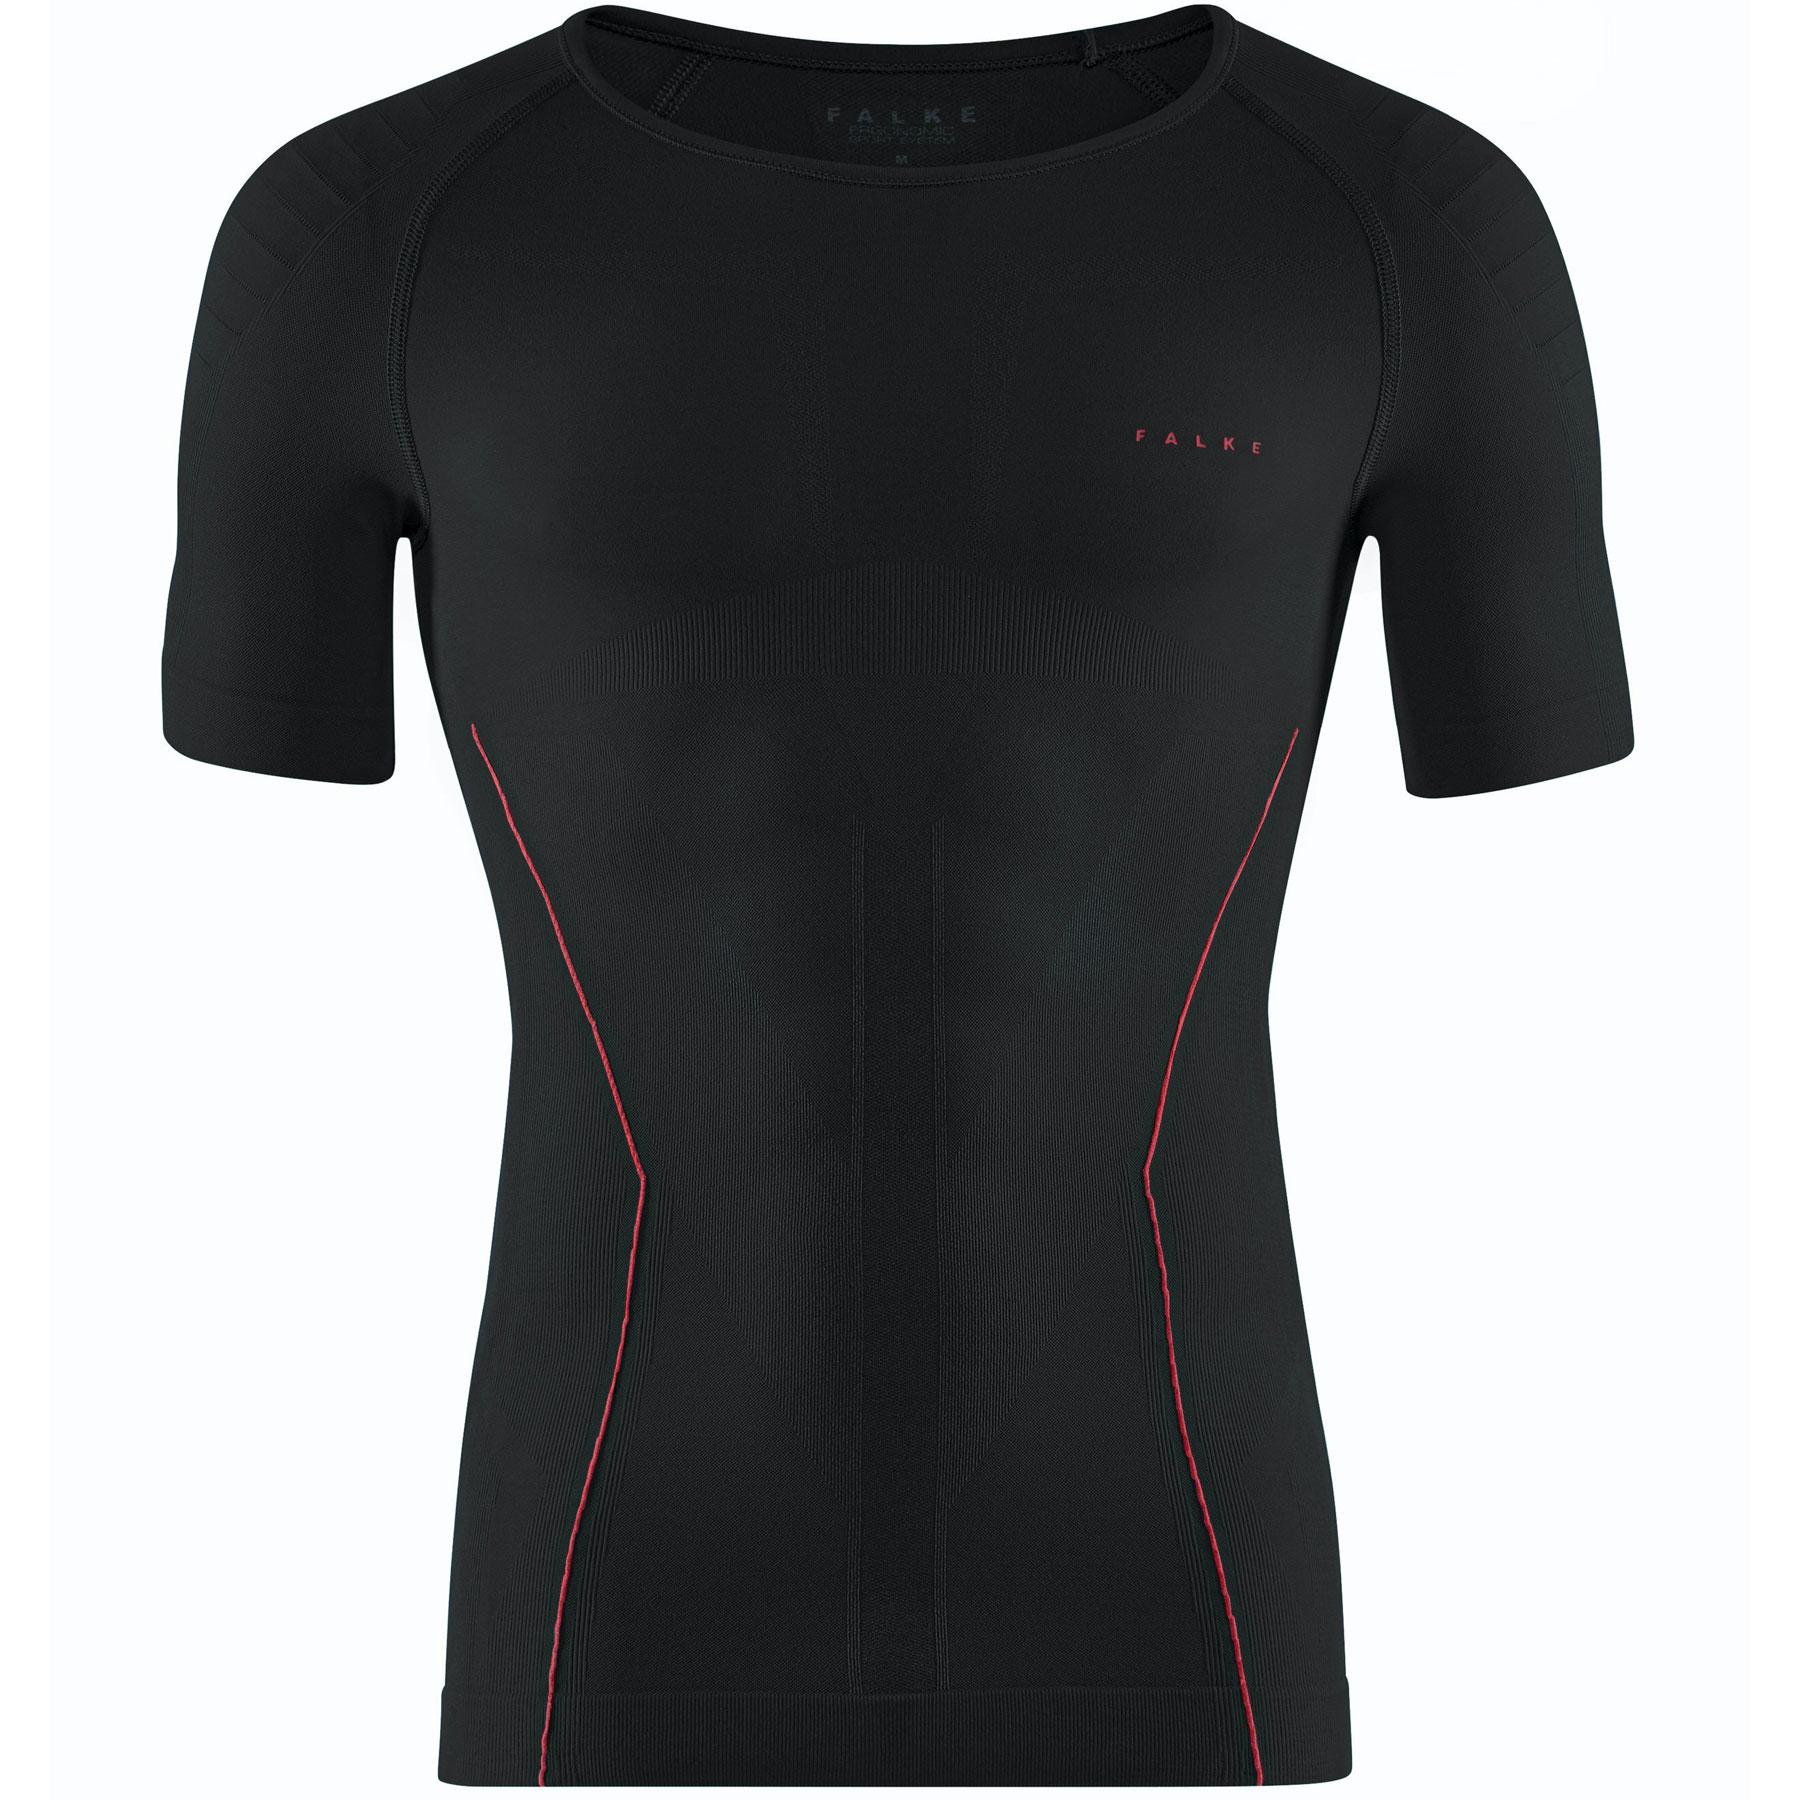 Falke Short Sleeved Shirt Warm - black-fuego